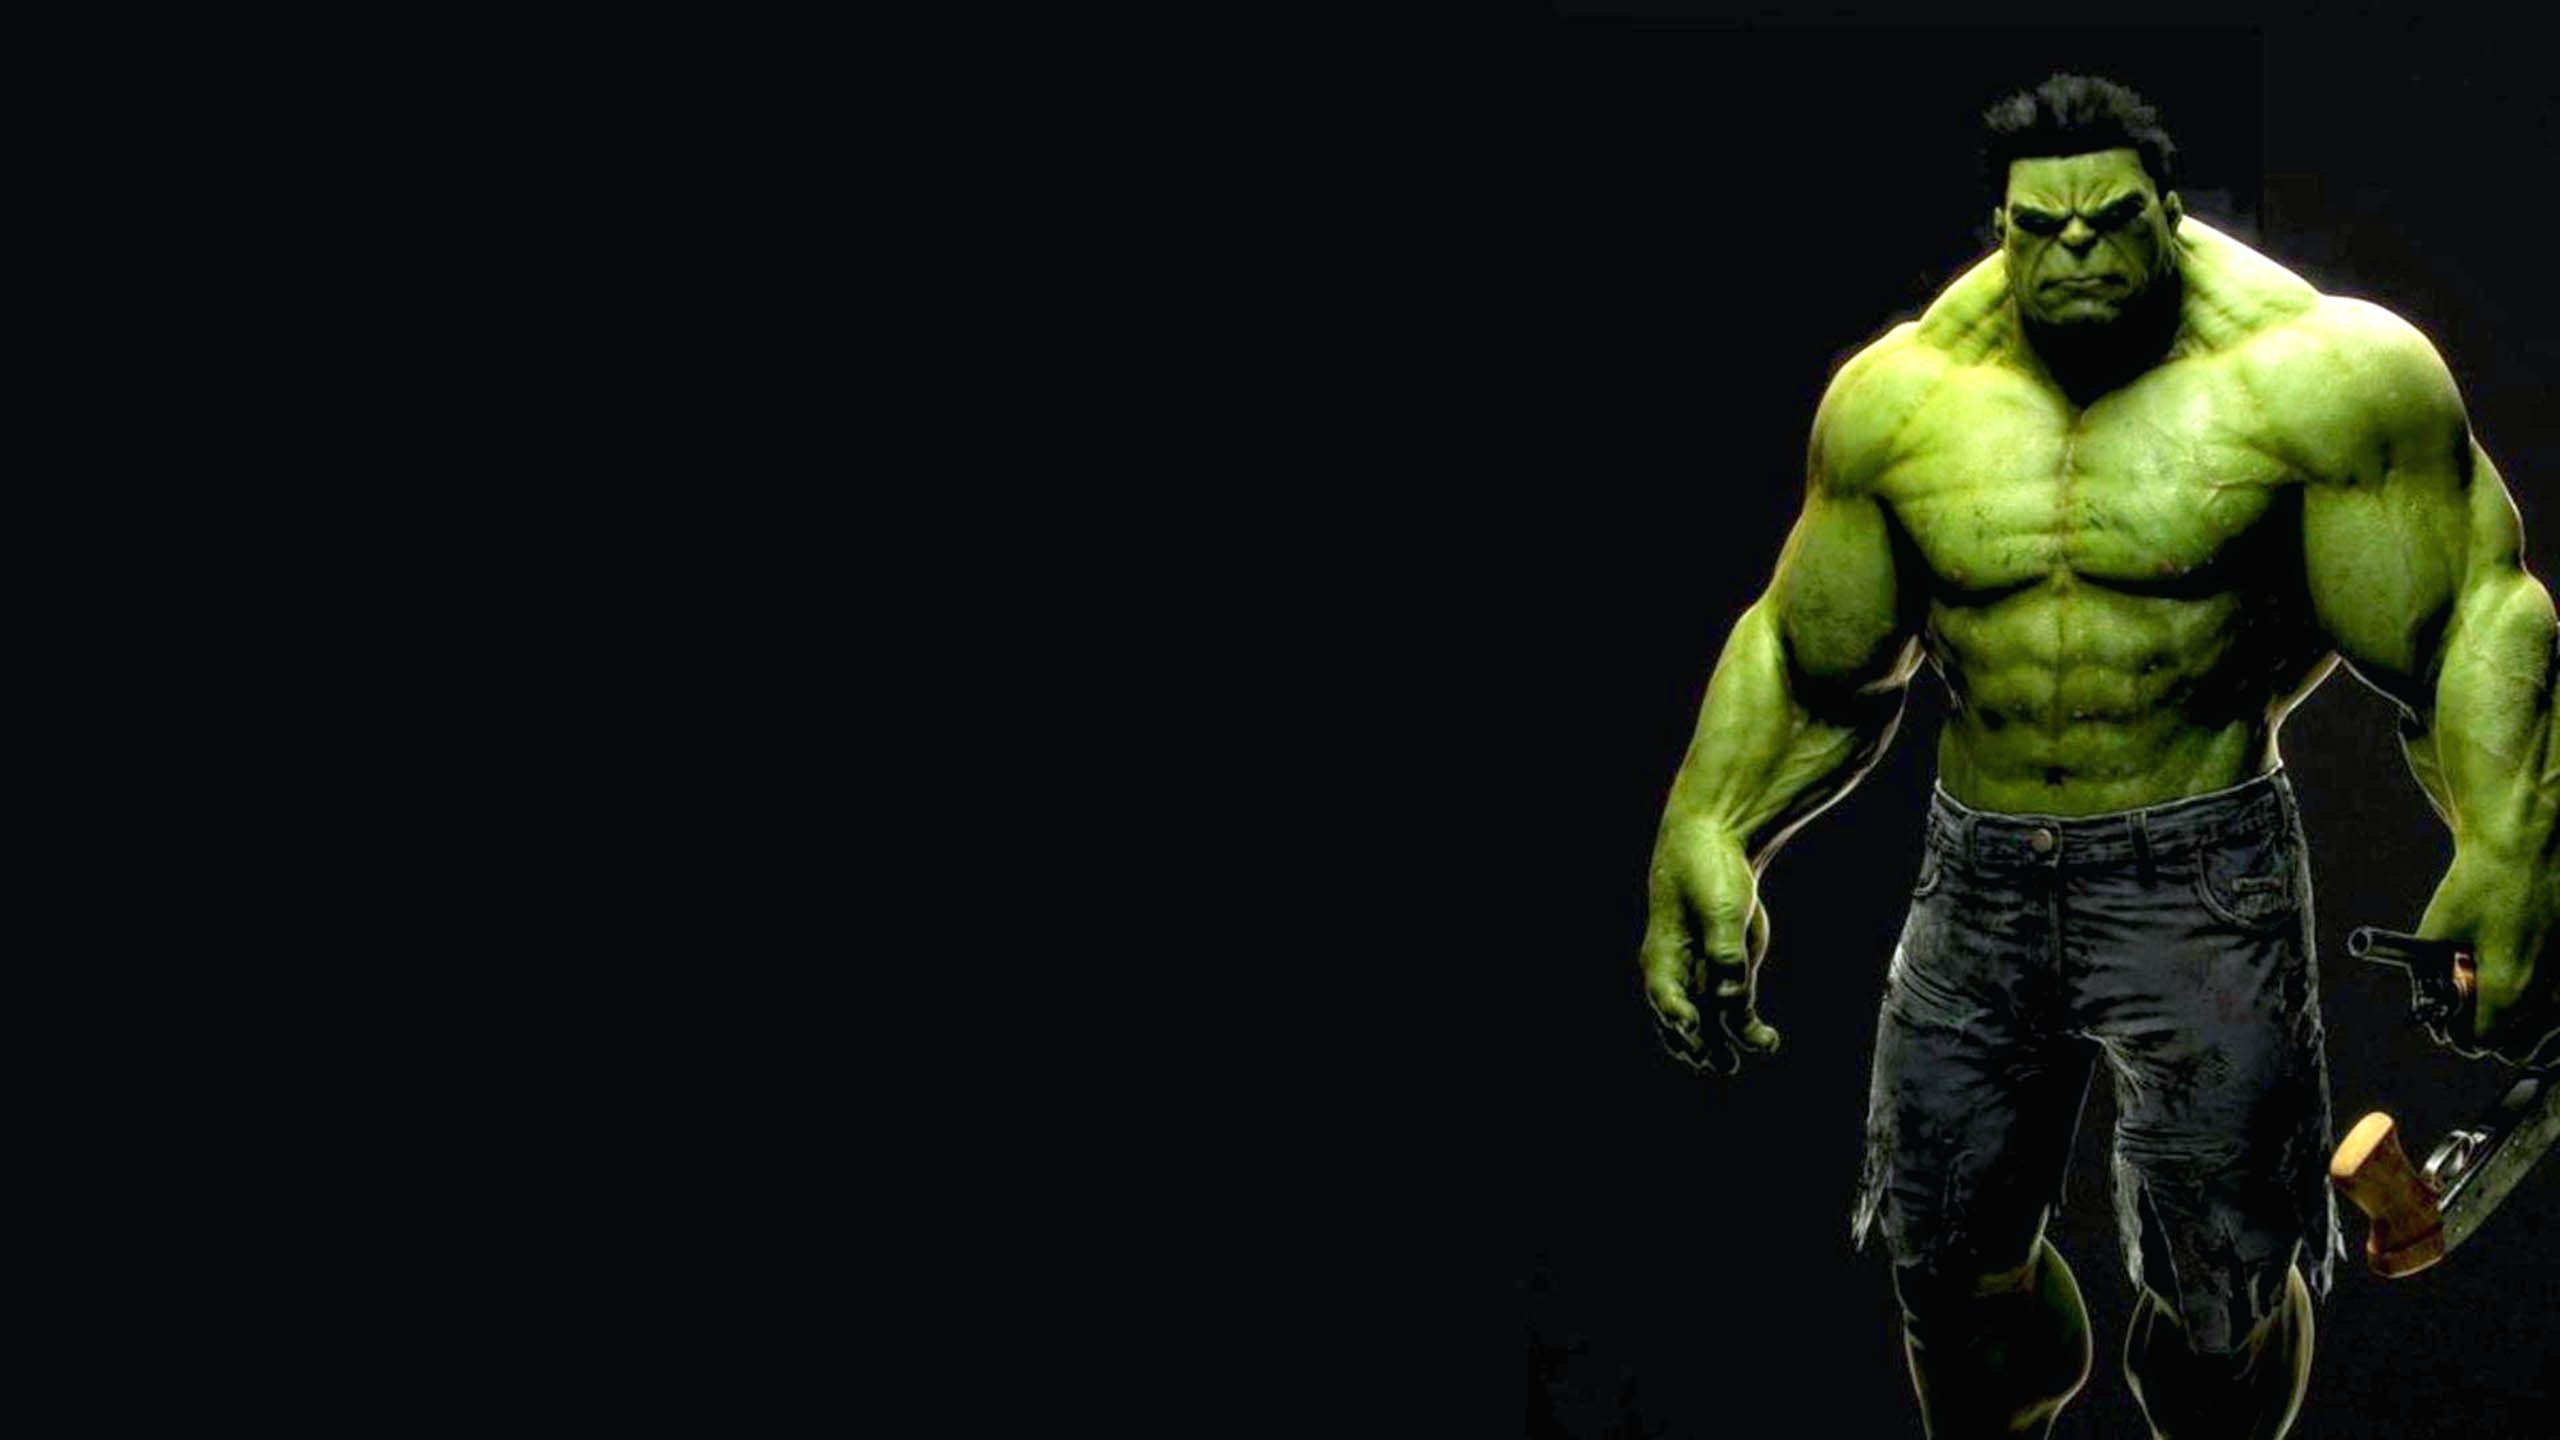 Gambar Hulk Http 1080wallpapernet Gambar Hulkhtml